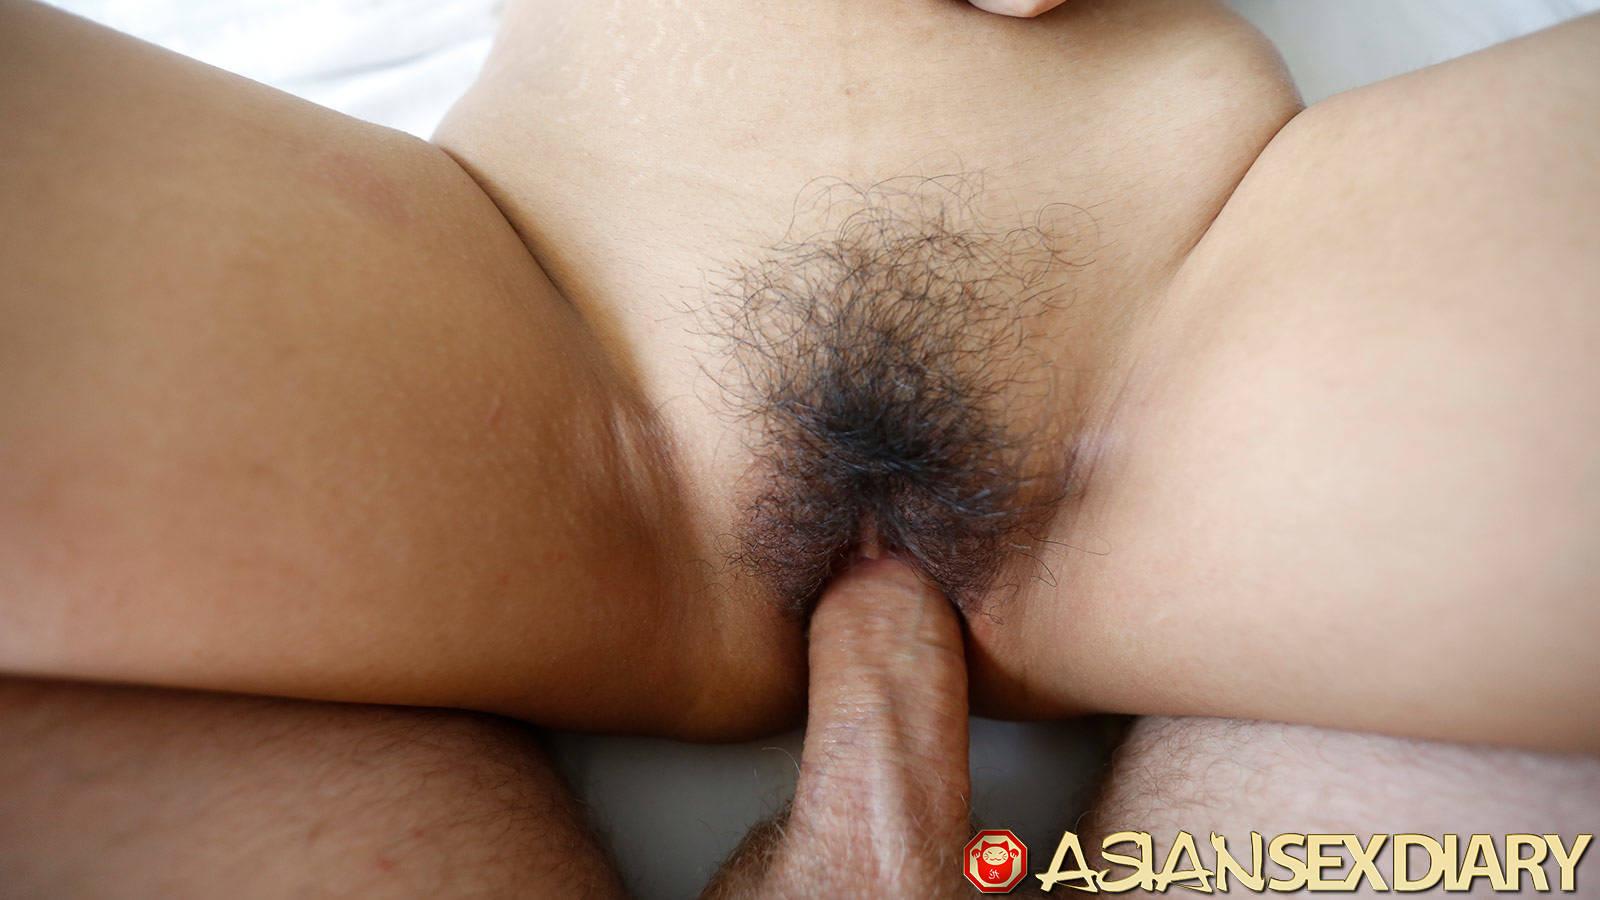 Clos up penetration bushy